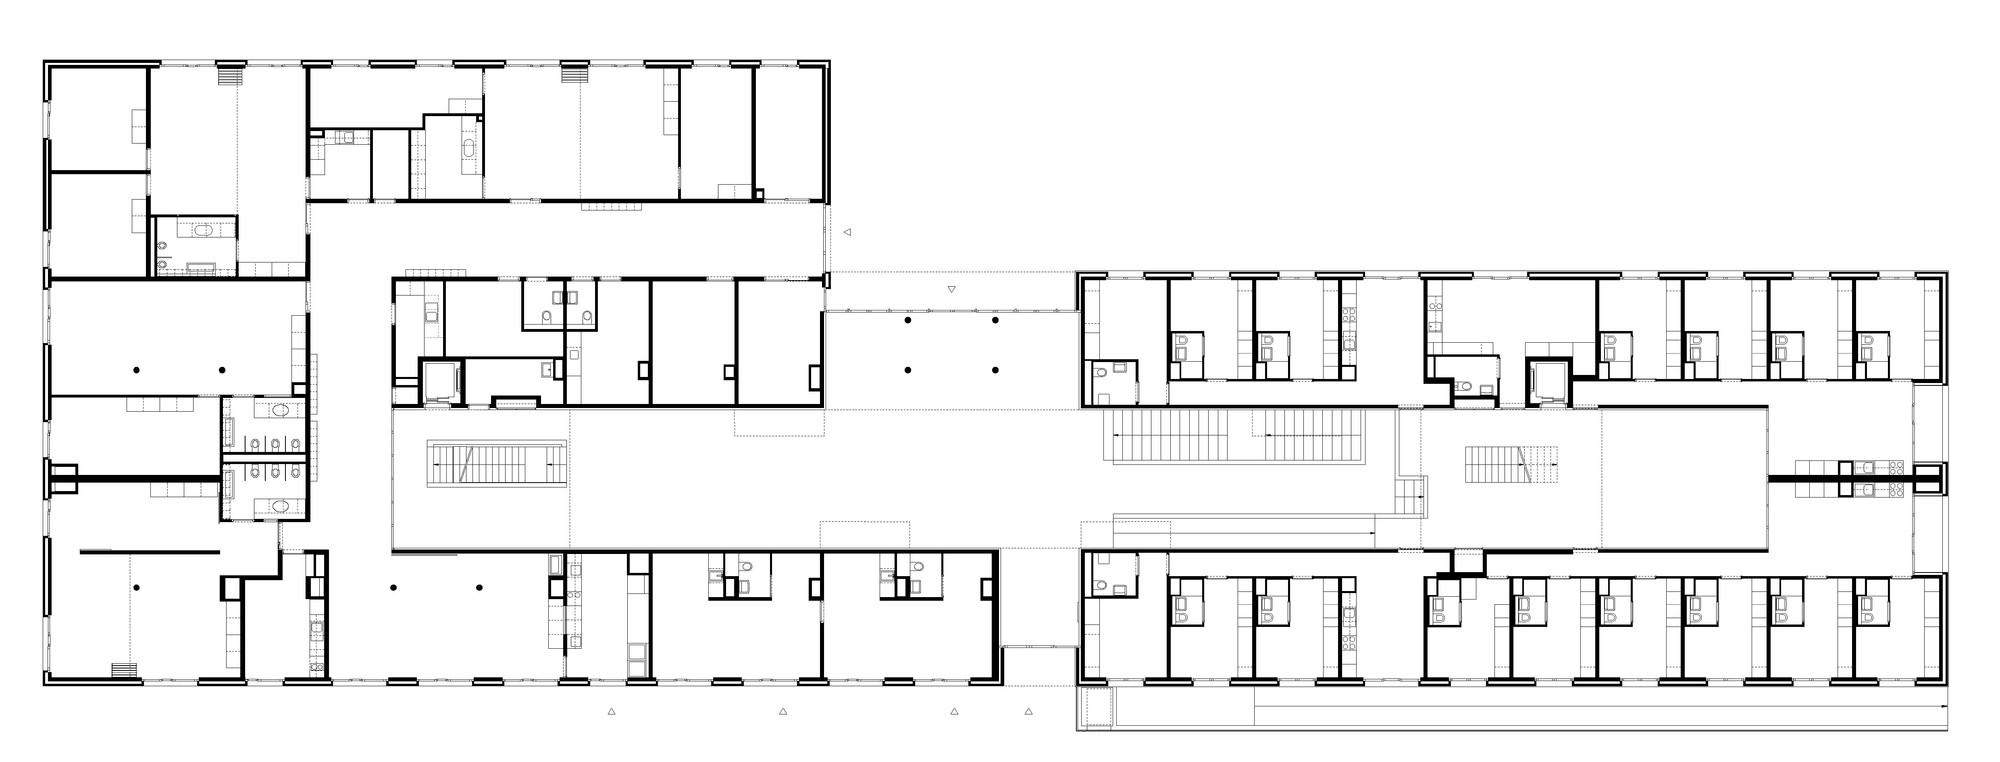 student housing floor plans